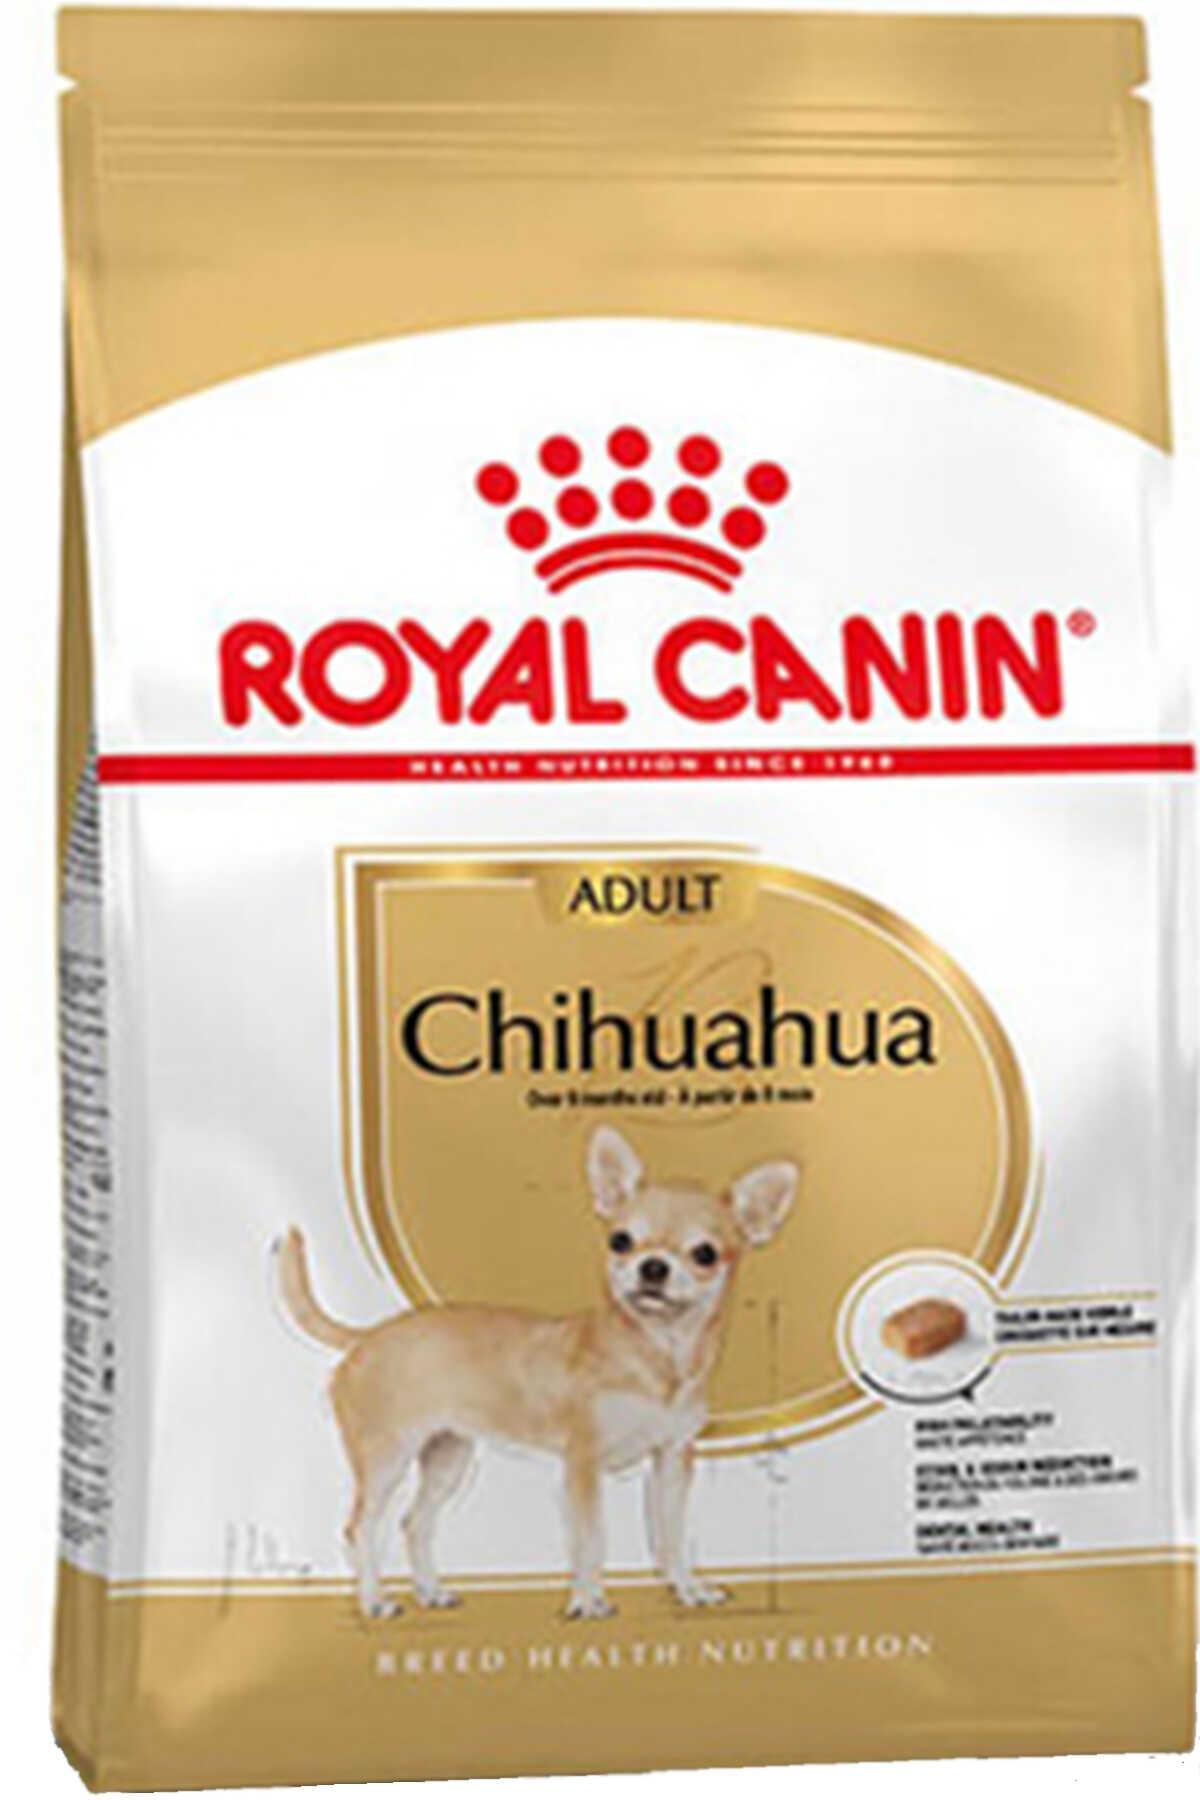 Royal Canin Chihuahua Yetişkin Köpek Maması 1,5kg